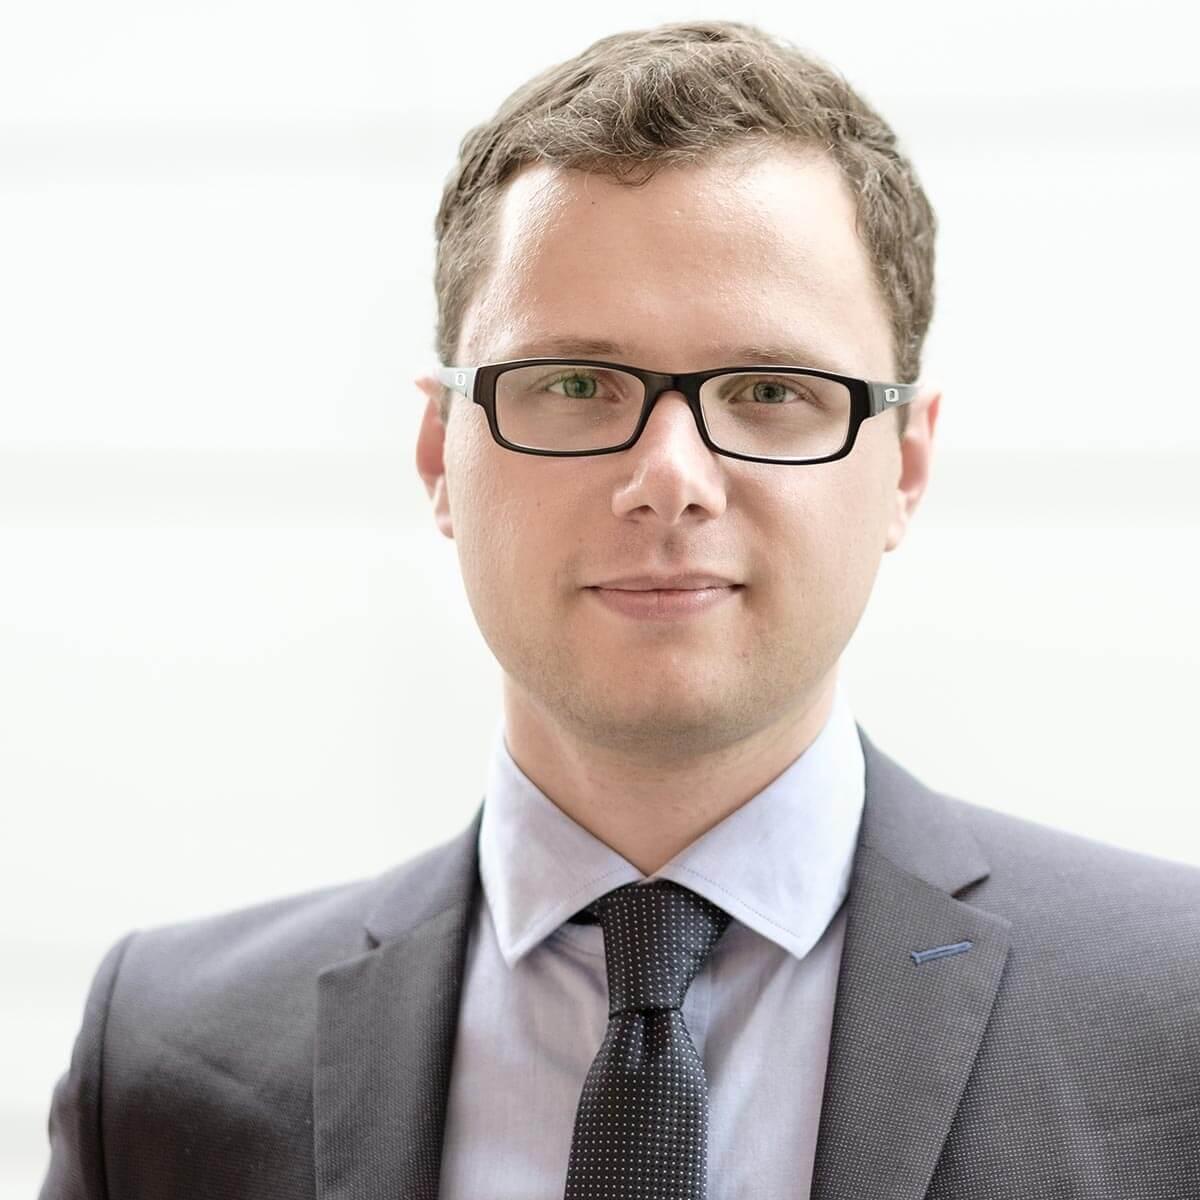 Jakob Zathammer